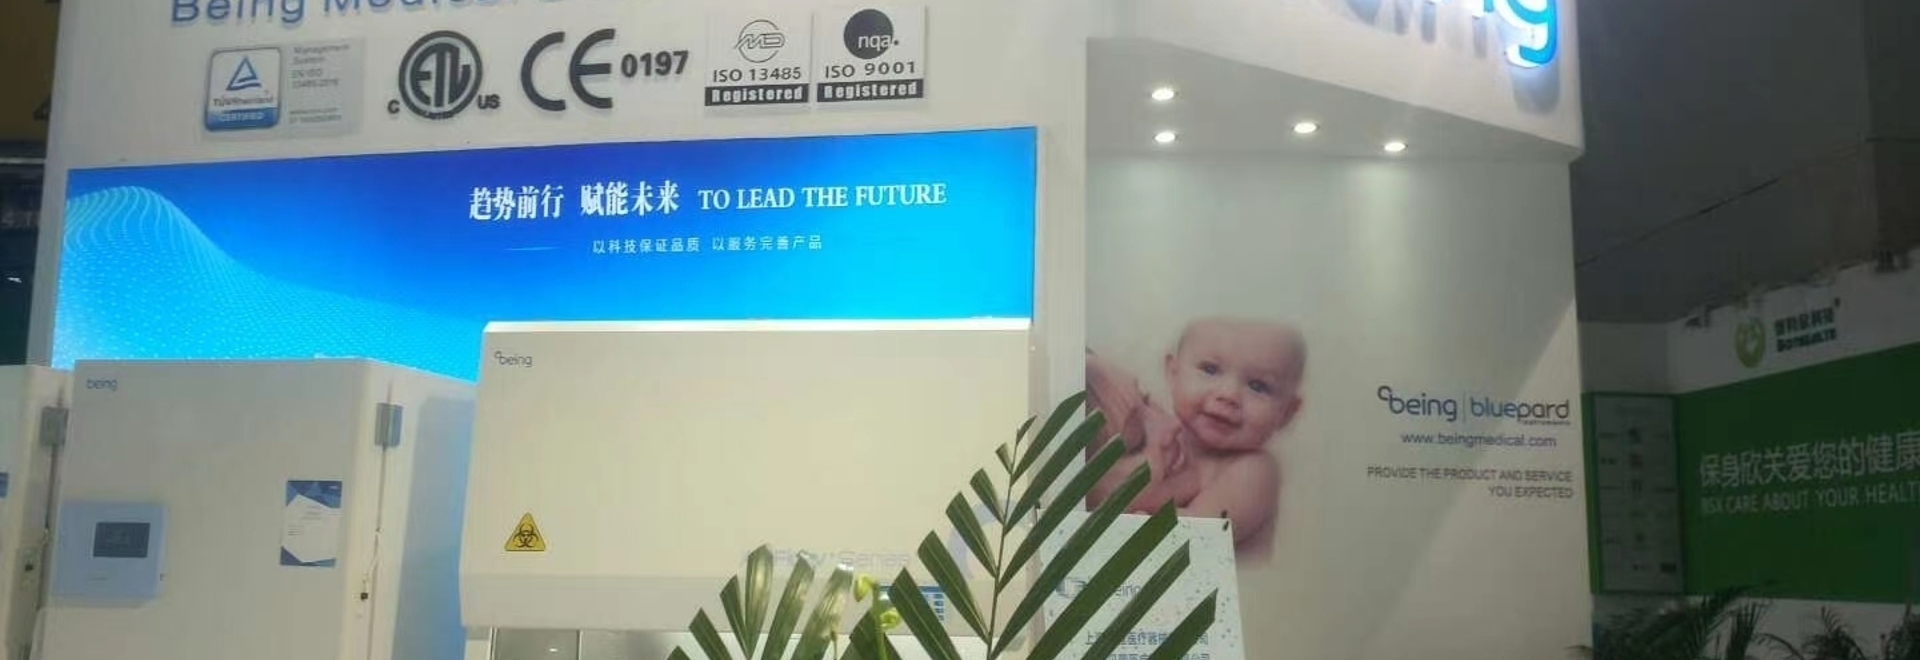 CMEF in shanghai